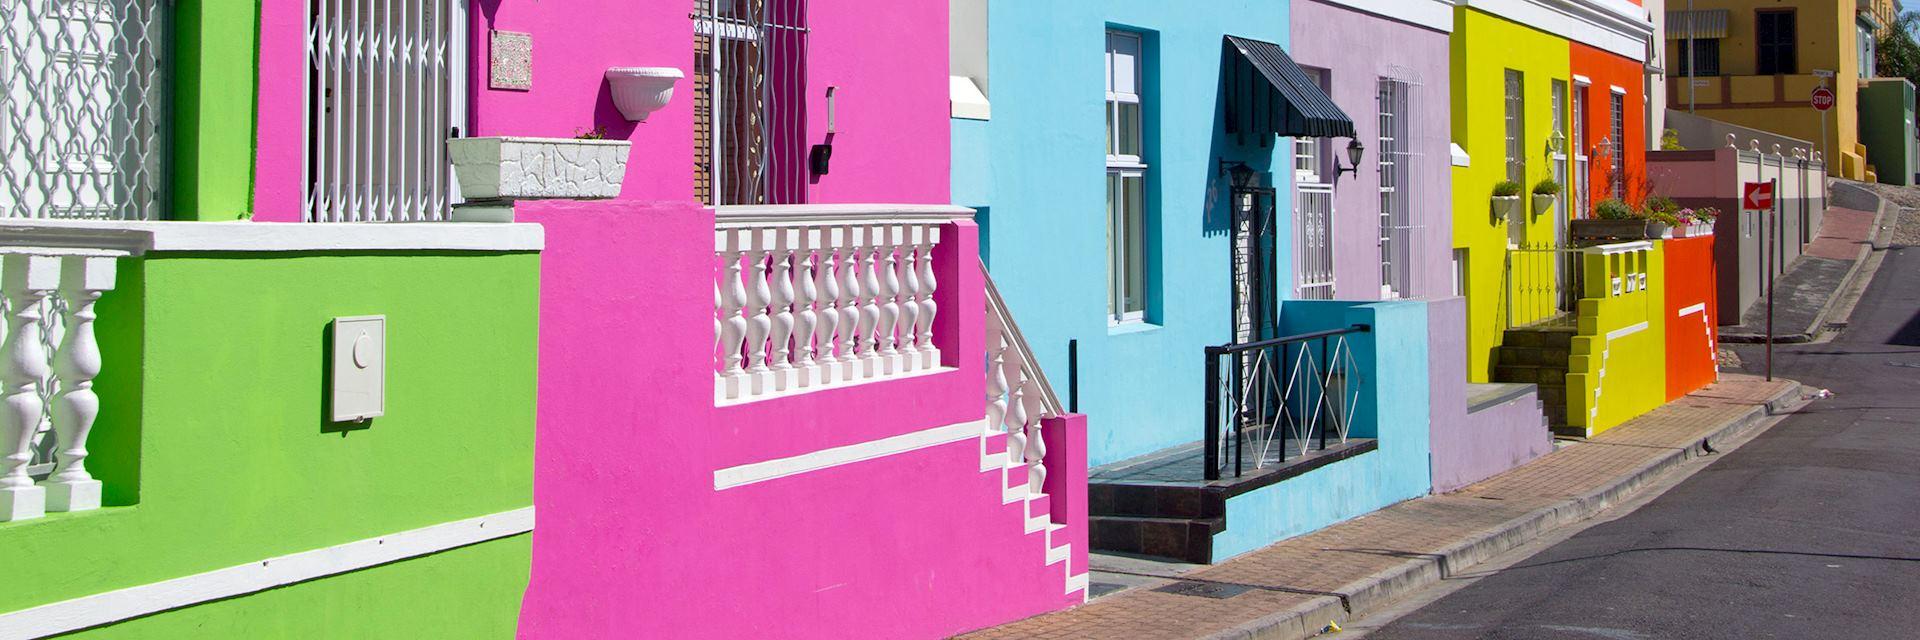 Bo Kaap, South Africa